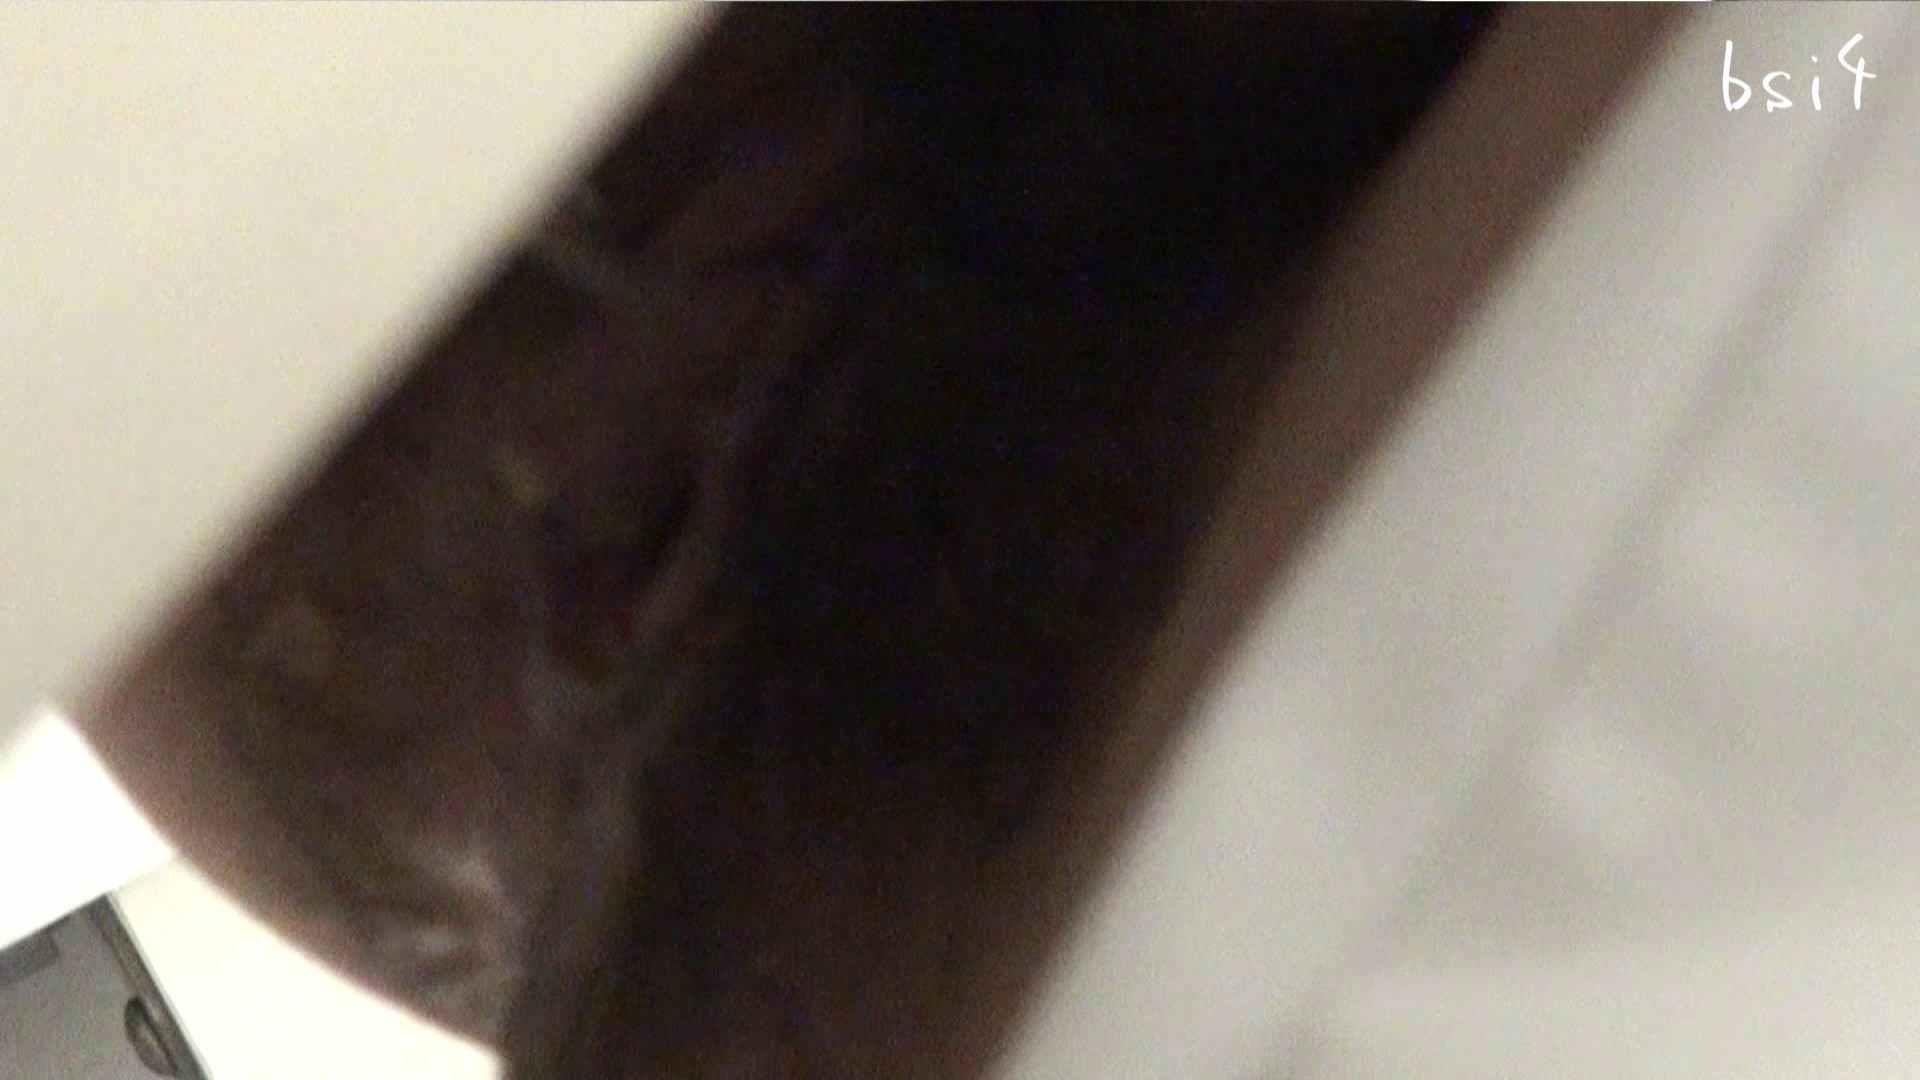 至高下半身盗撮-PREMIUM-【院内病棟編 】 vol.04 ナース ワレメ動画紹介 71PIX 39